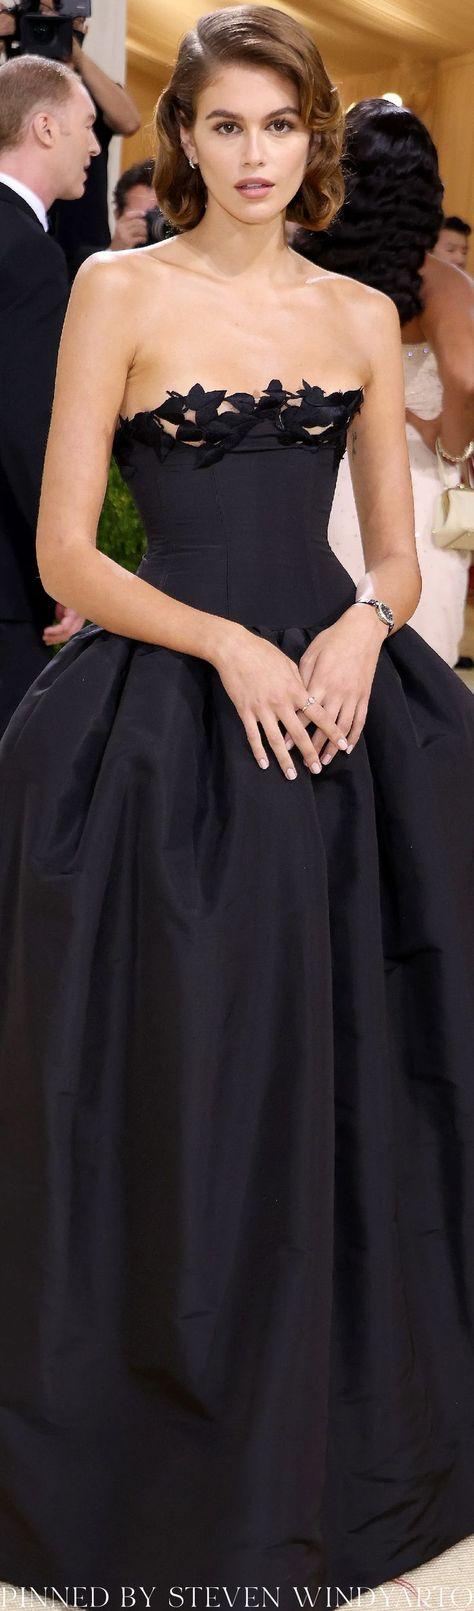 Kaia Gerber Look From The 2021 Met Gala Red Carpet #metgala2021 #metgala #kaiagerber